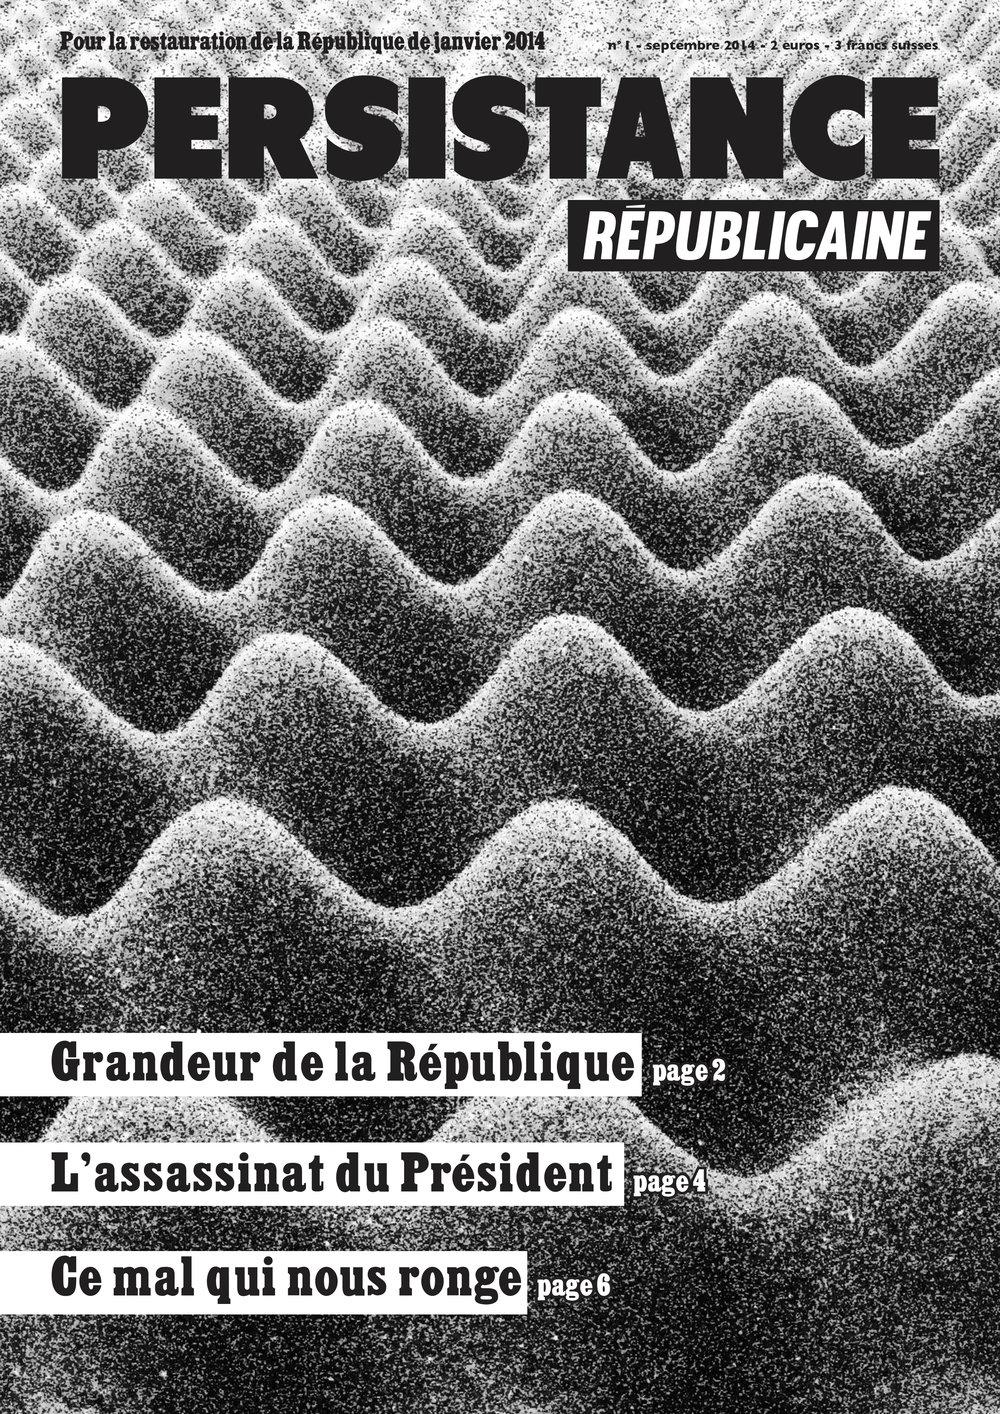 persistance_republicaine-web-1.jpg